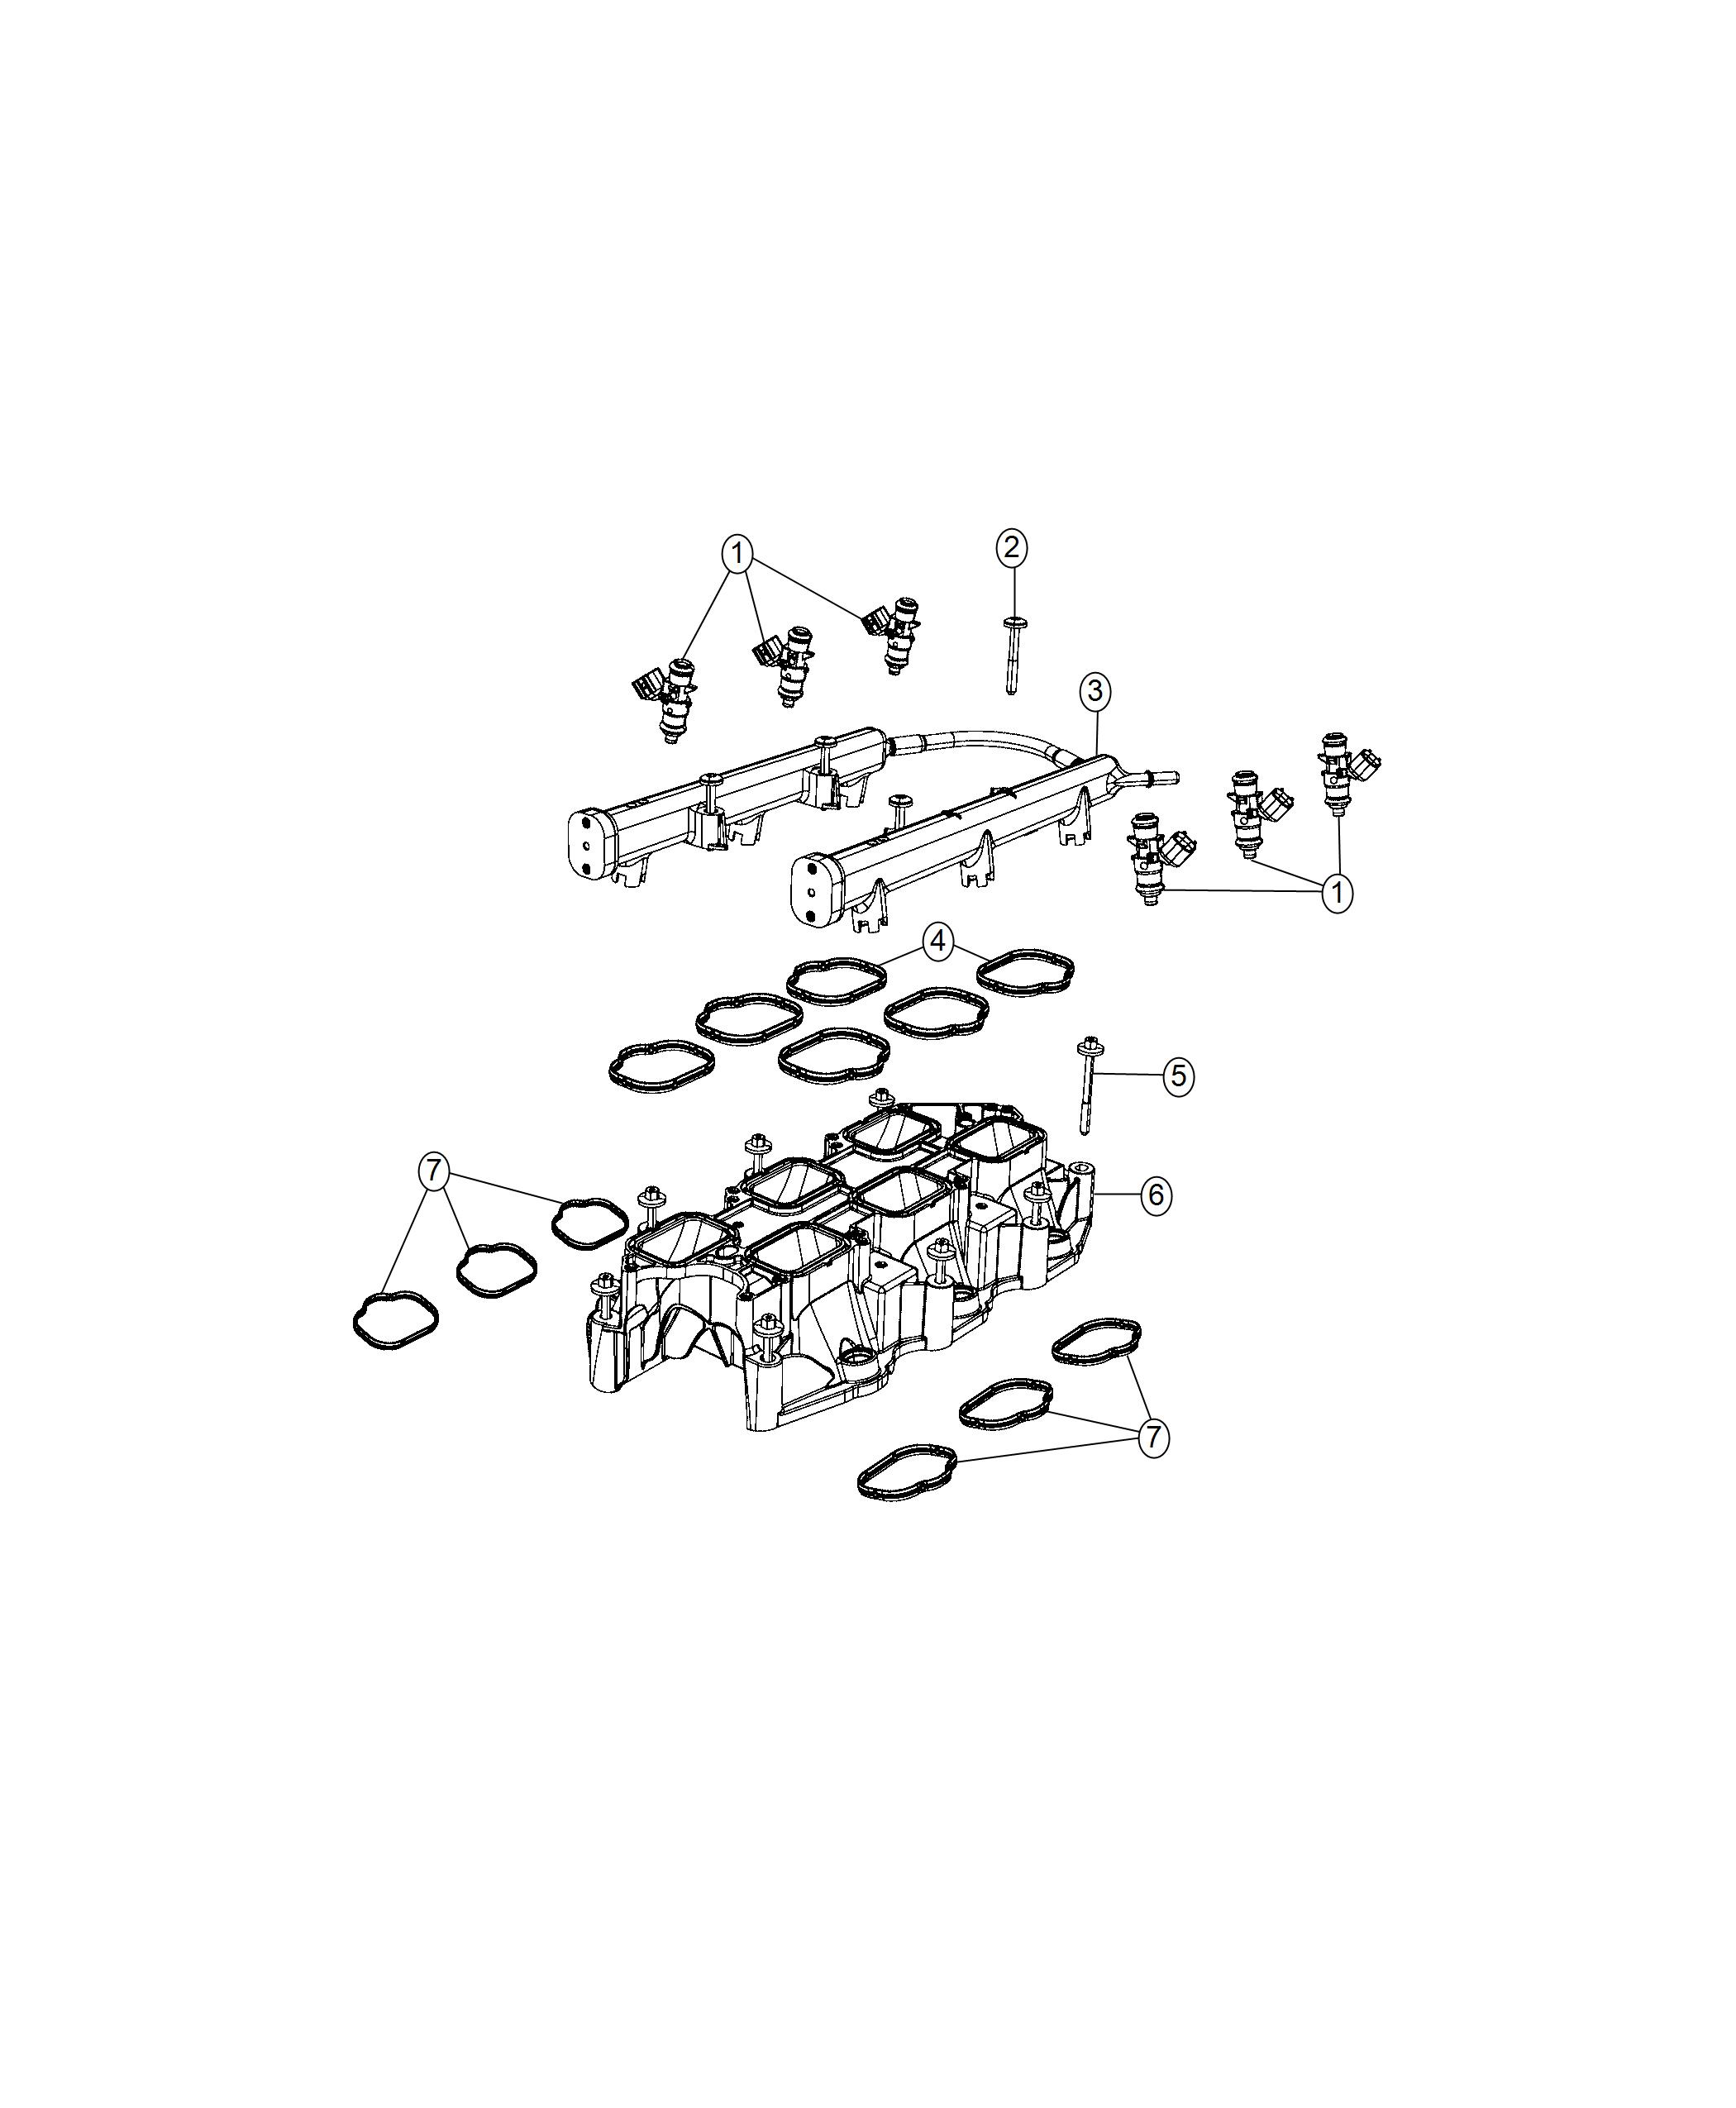 Jeep Wrangler Seal Plenum Engine Vvt Upg